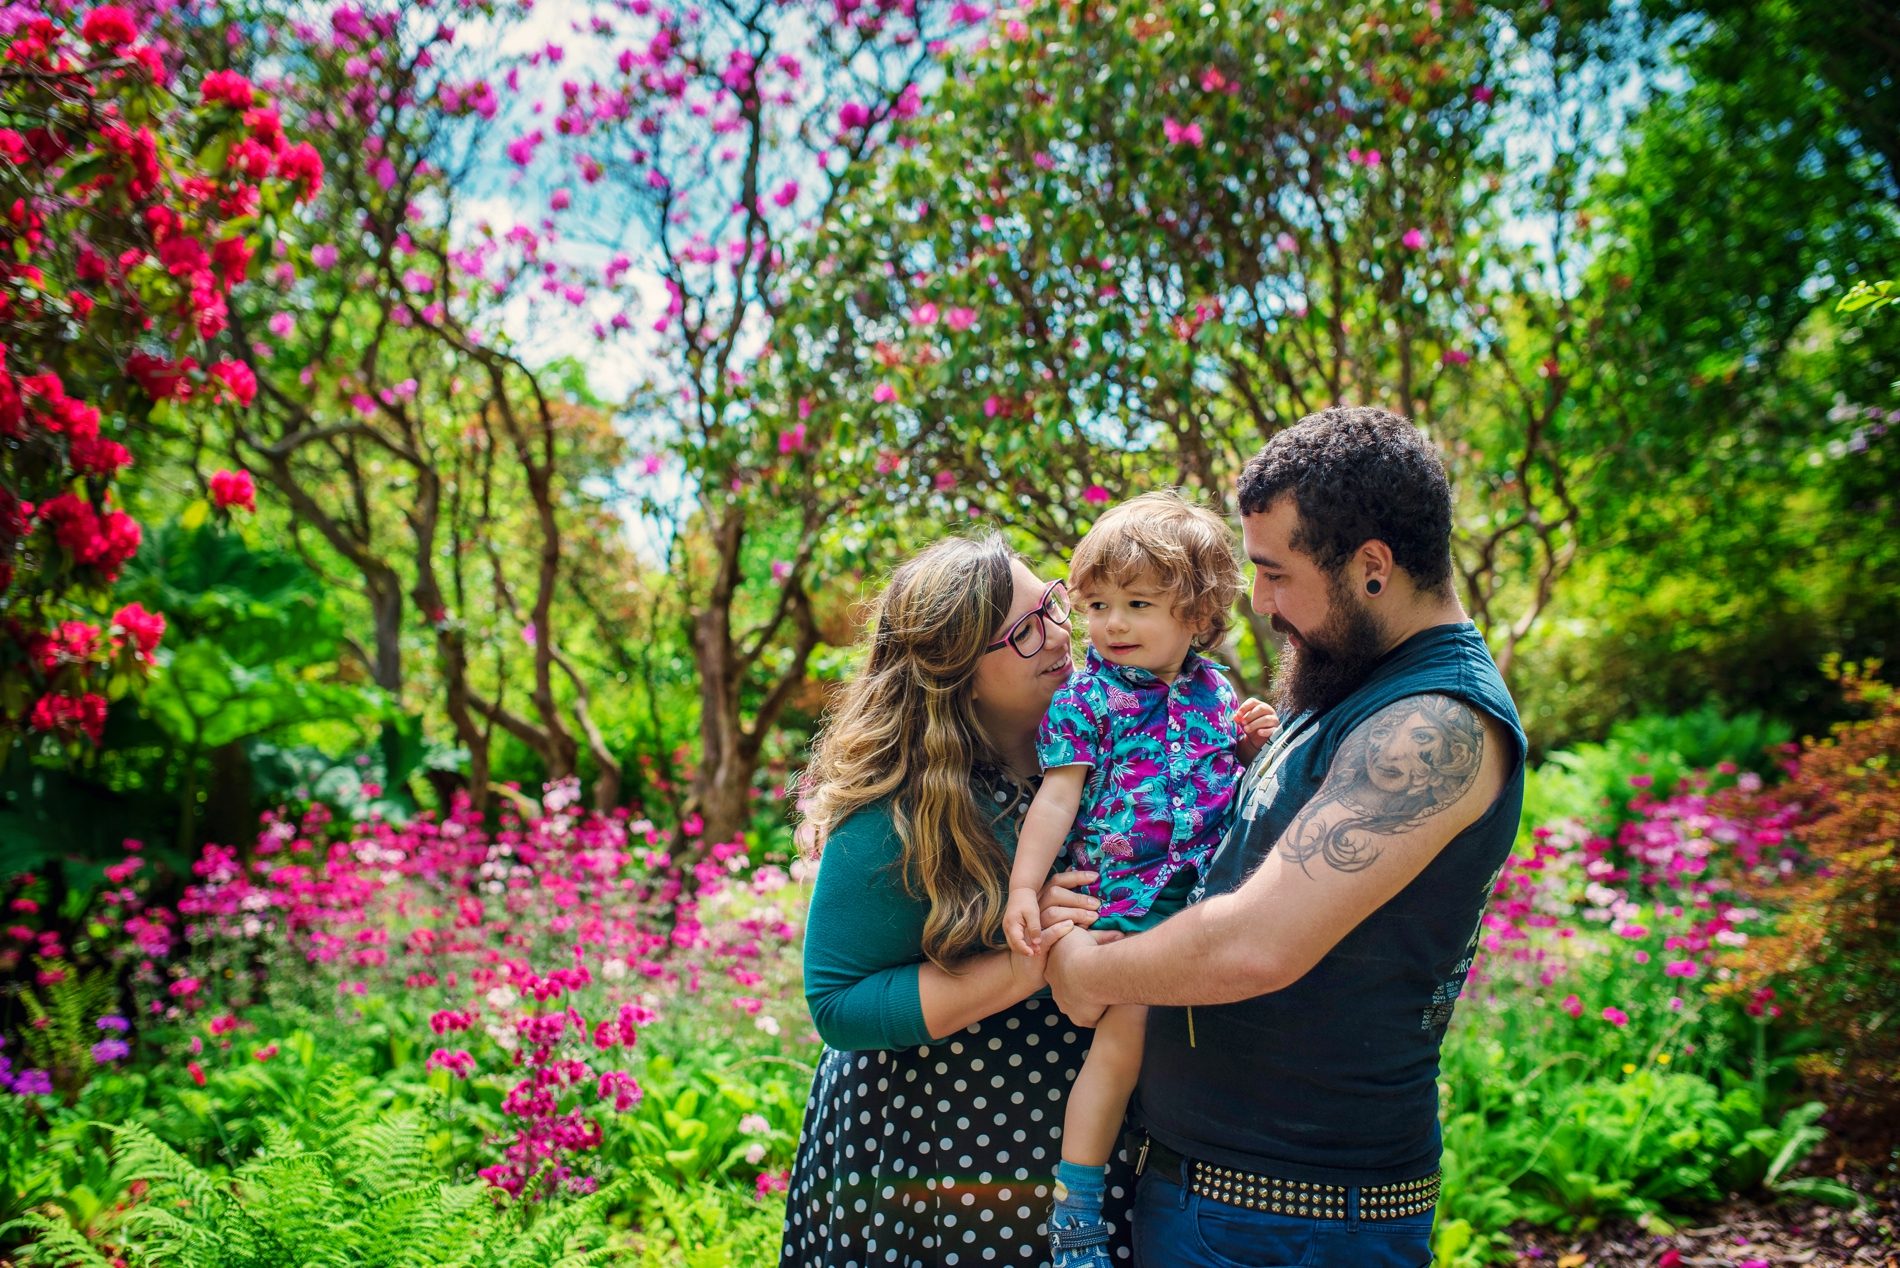 Hampshire-Family-Photograper-Hampshire-Family-Portraits-Photography-by-Vicki_0001